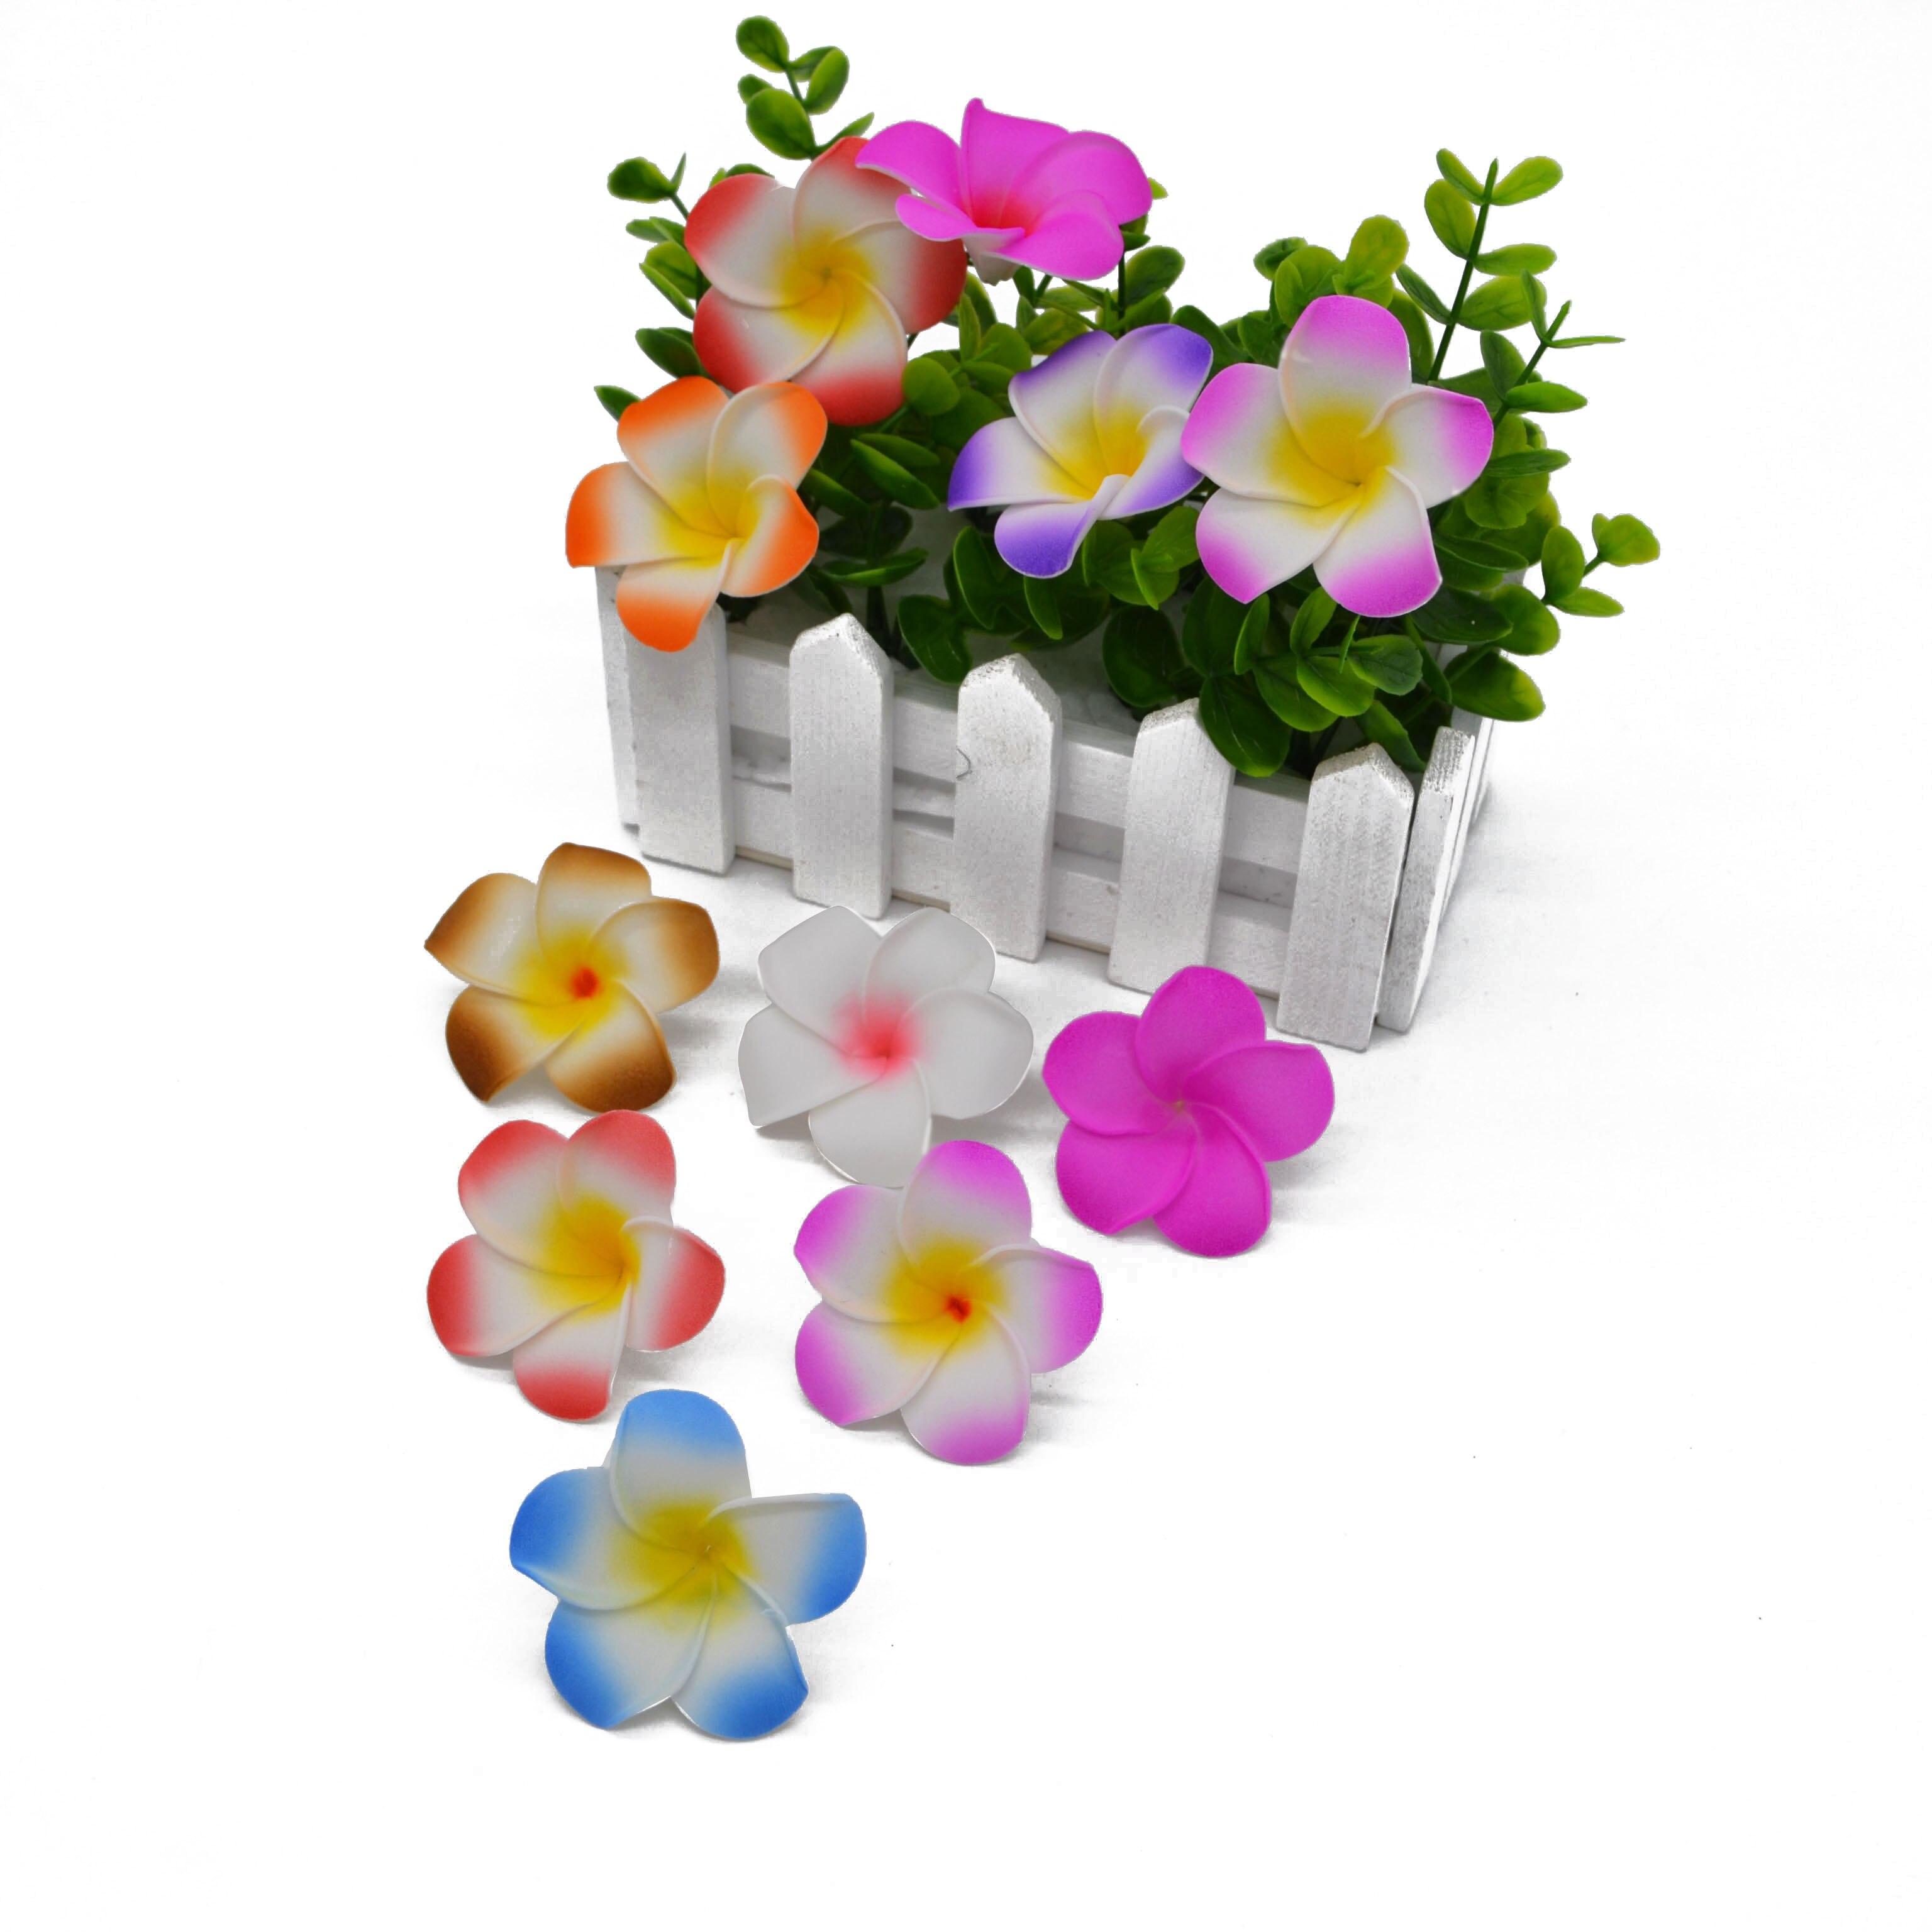 20pcs Plumeria Hawaiian Foam Frangipani Flower Artificial Silk Fake